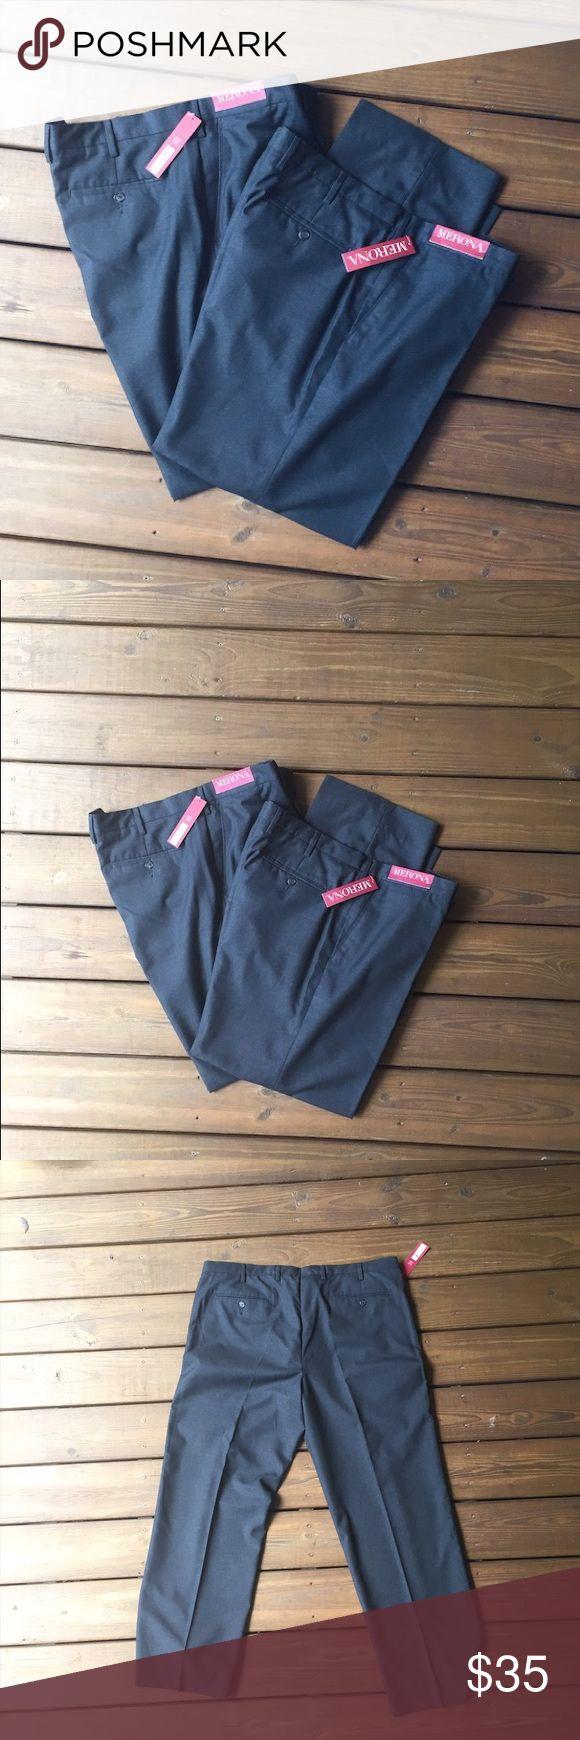 Two New pair of men's slacks size 42 x34 pants Two New pair of men's slacks. Never been worn with tags size 42 x34 Merona Pants Dress